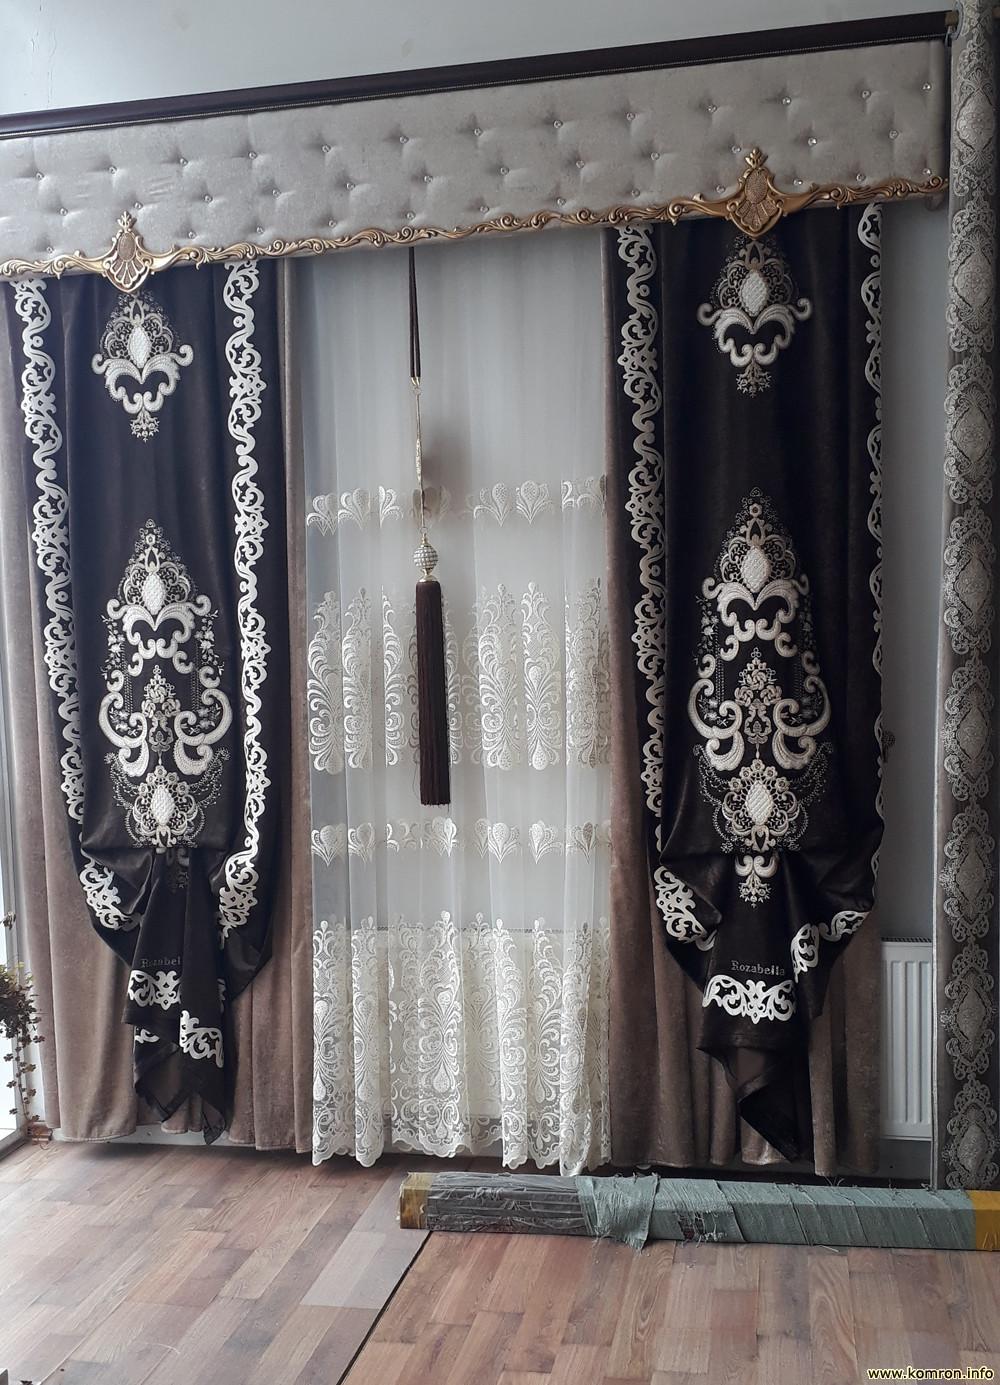 Magozai pardaho «Sabo» dar Dushanbe